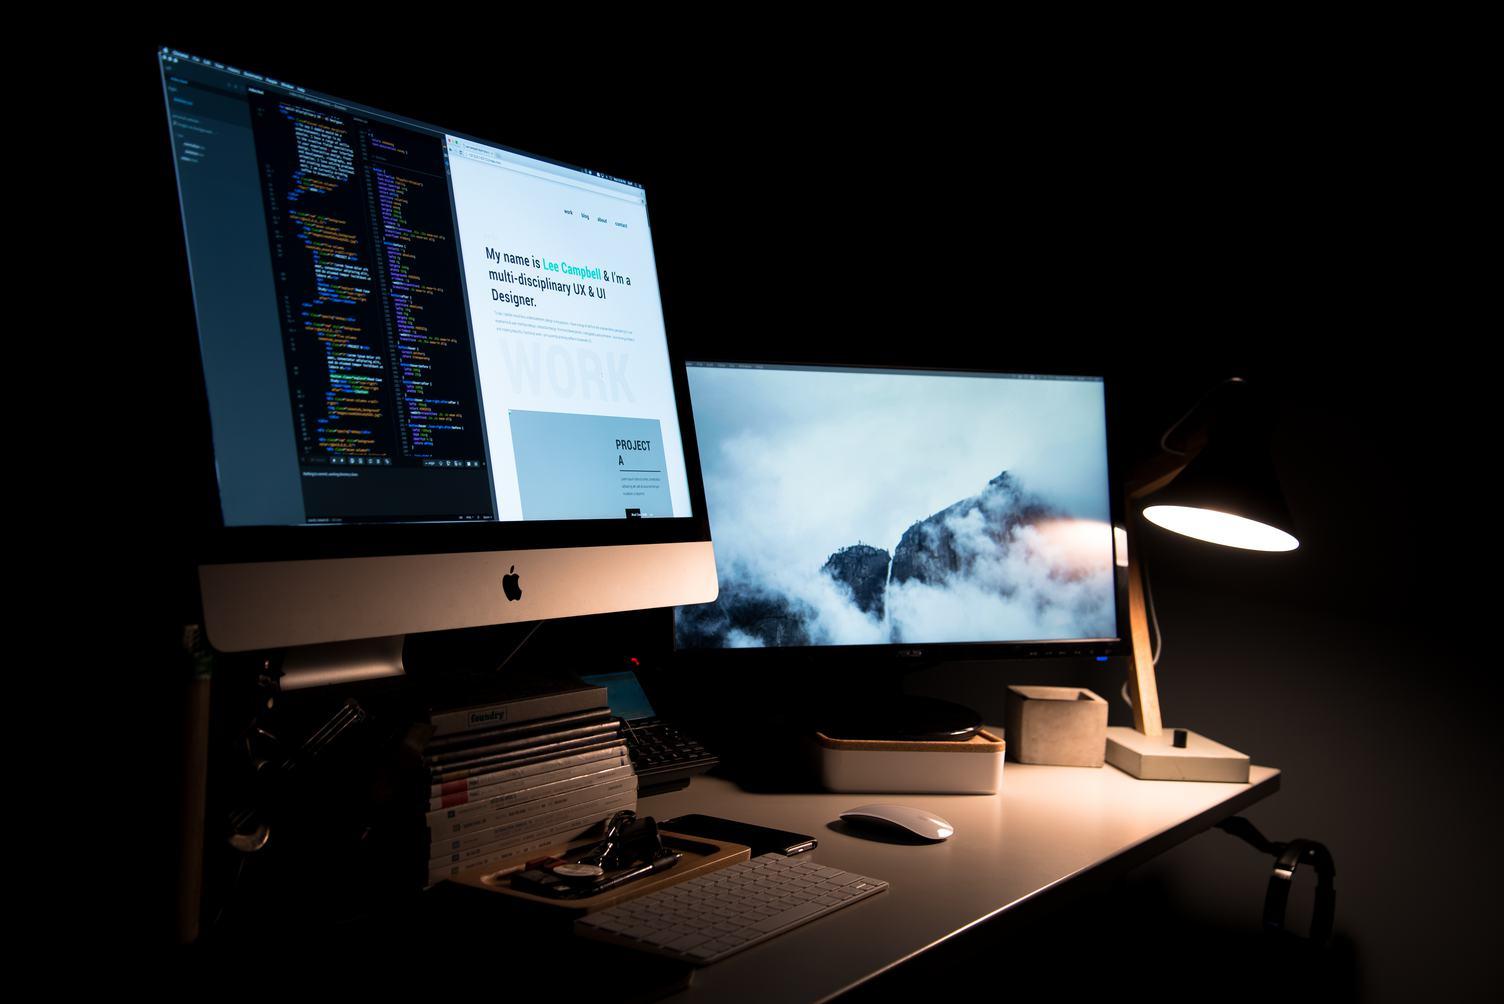 Designing on iMac in a Dark Office